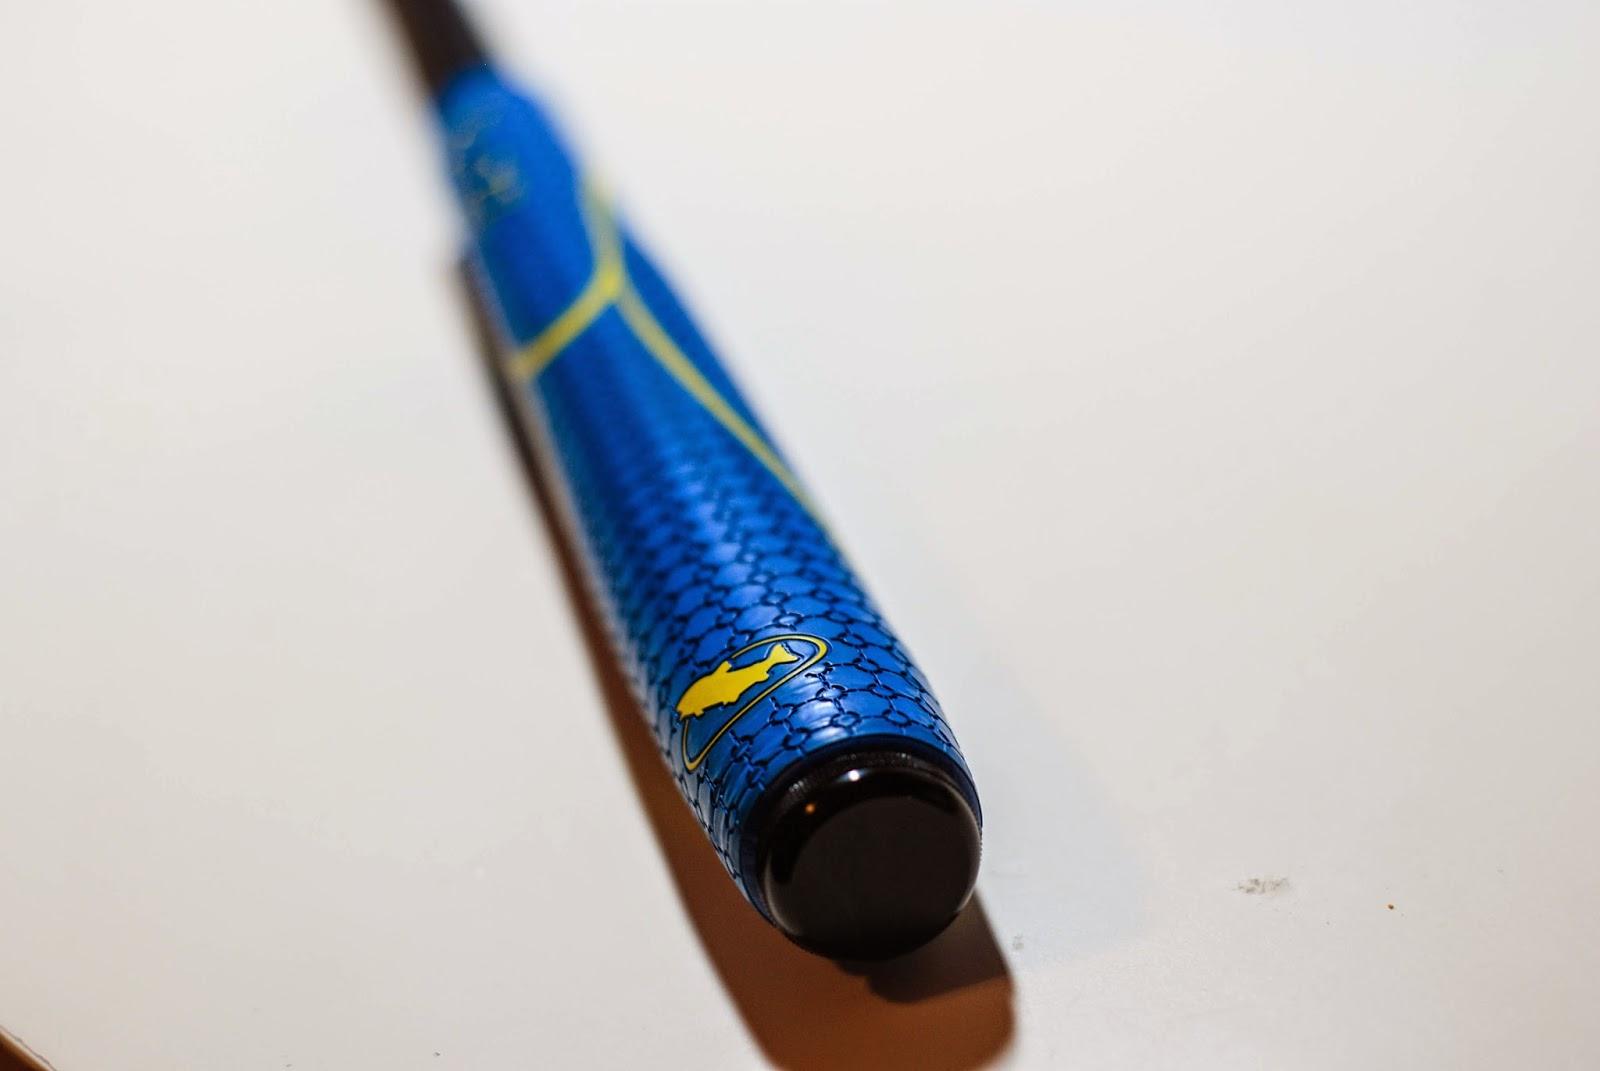 The tenkara customs x winn grips rod build for Fishing rod grips